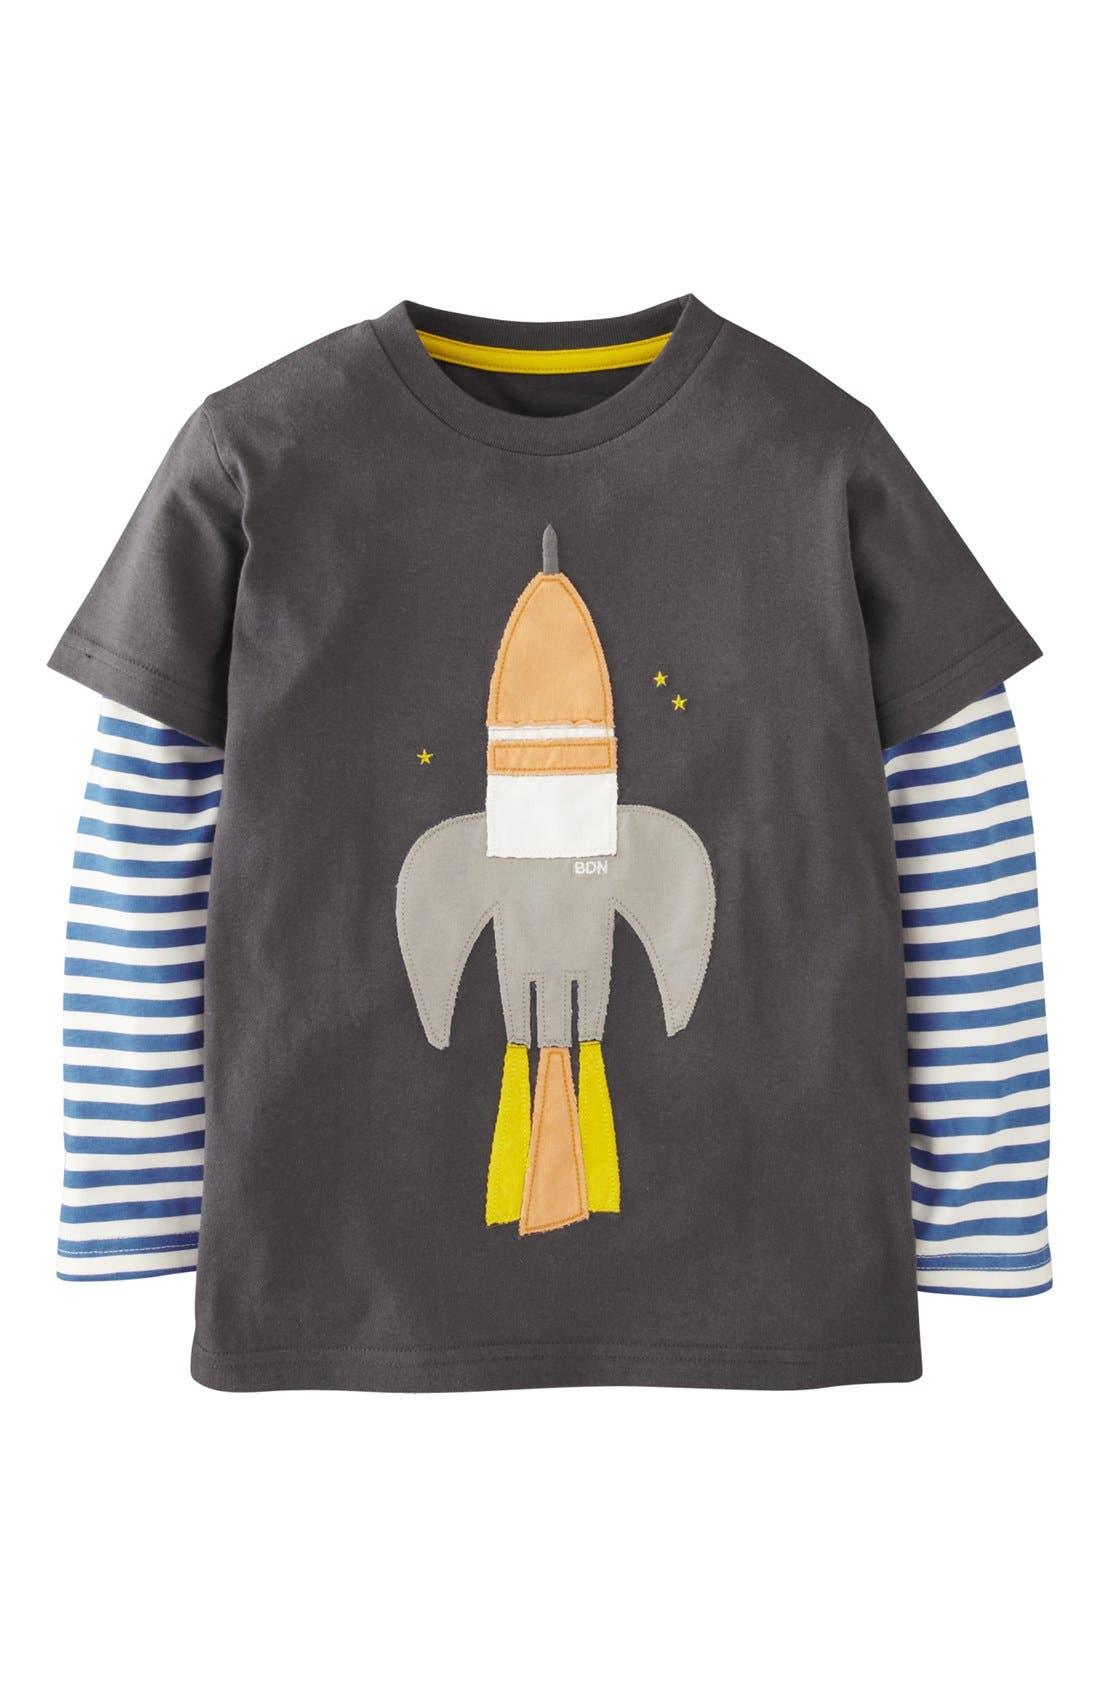 Main Image - Mini Boden 'Big Vehicle' Appliqué Layered Sleeve T-Shirt (Toddler Boys, Little Boys & Big Boys)